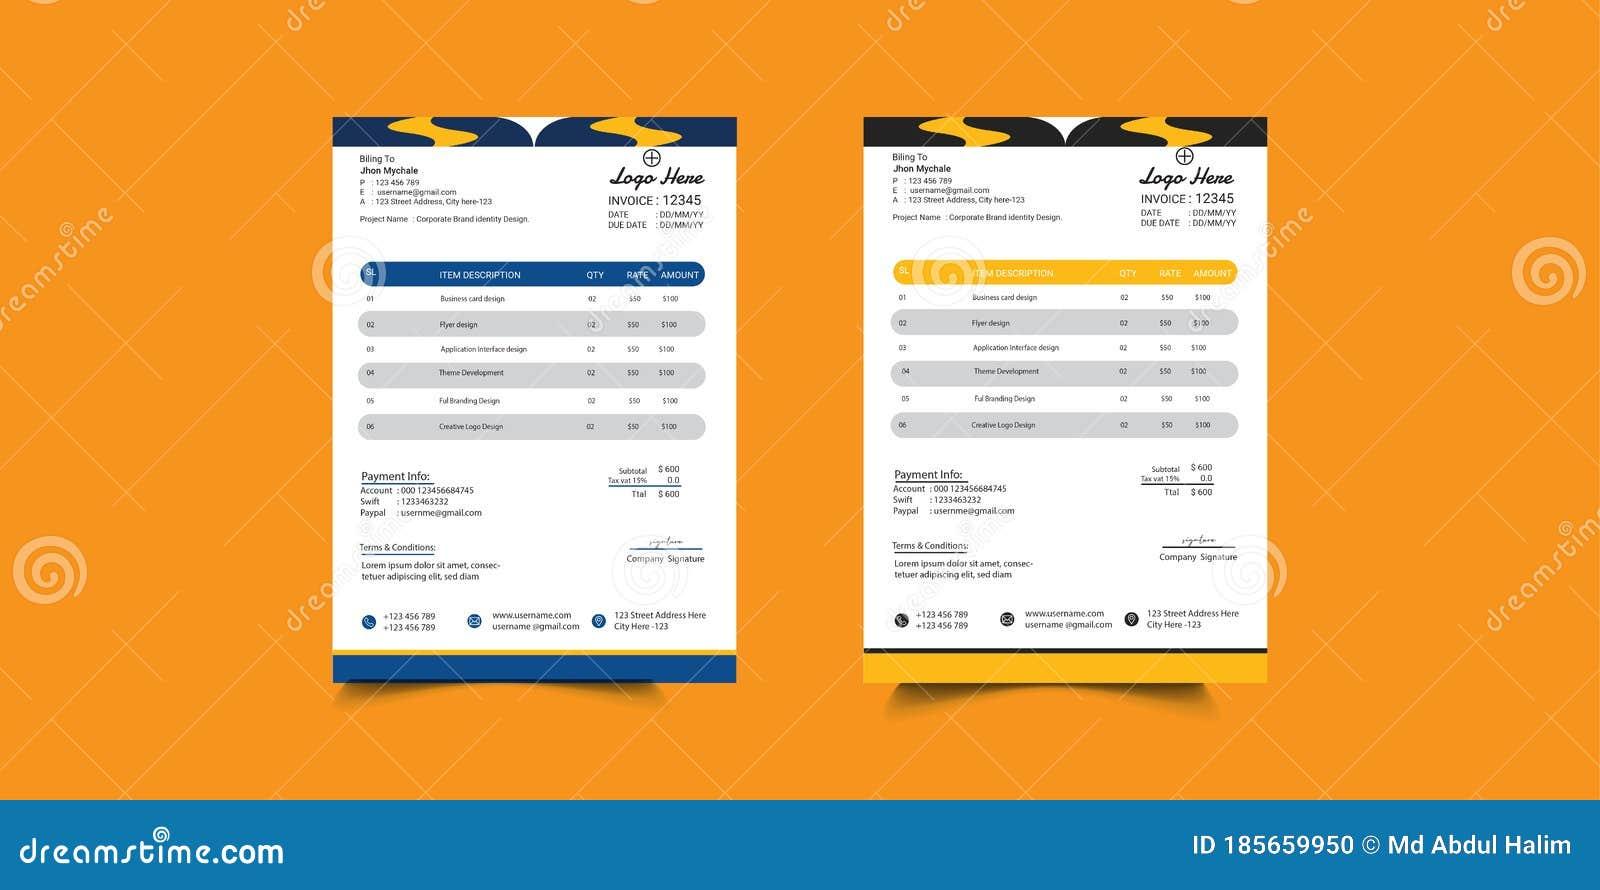 Creative Invoice Template Design Minimalist Invoice Template Design For Your Business Stock Vector Illustration Of Accounting Bill 185659950